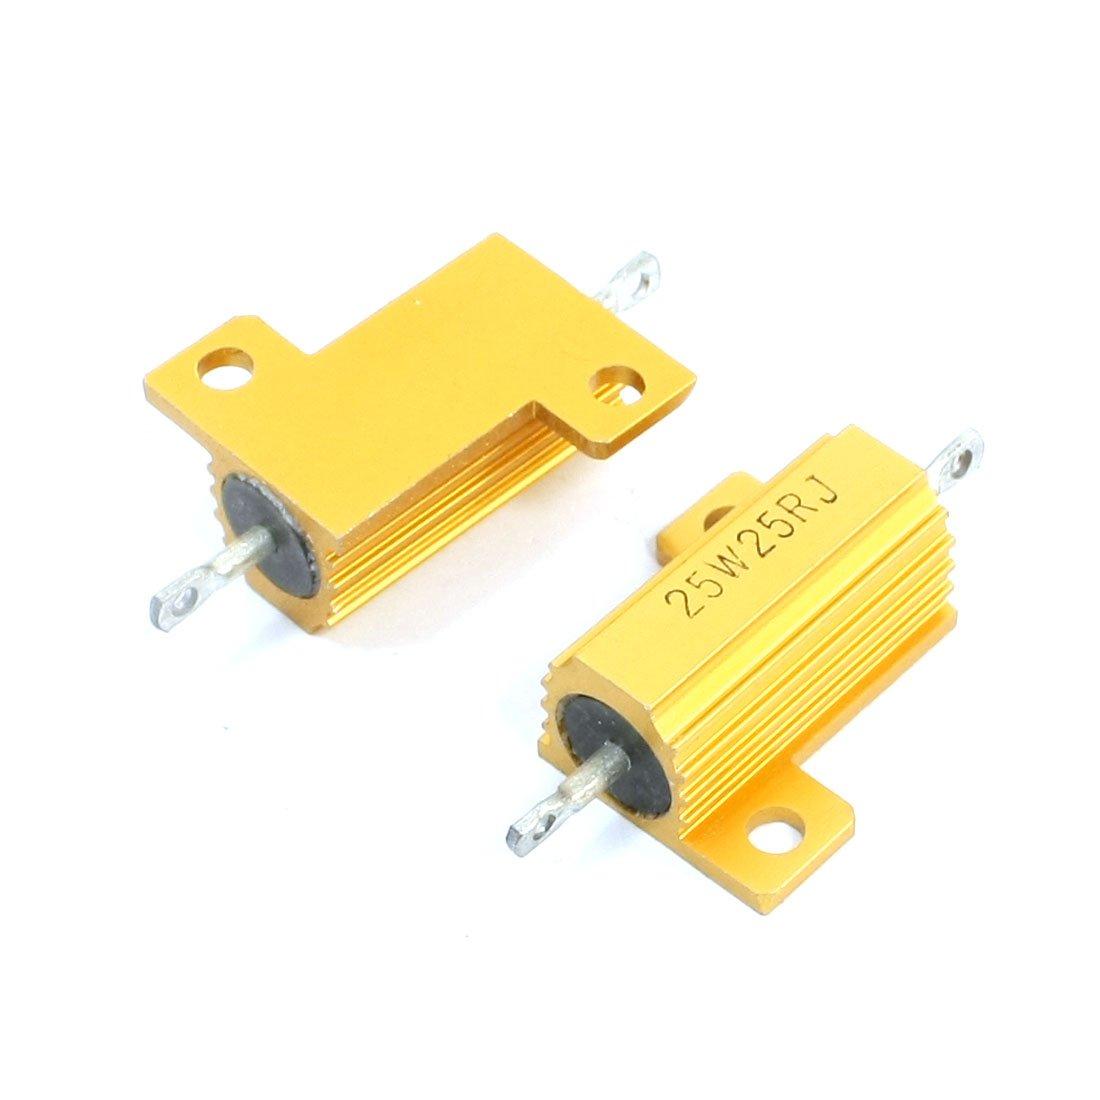 2 PCS Gold Ton Kü hlkö rper Aluminium Untergebracht Fall Widerstand 25 W 25 Ohm Sourcingmap a14012100ux0120